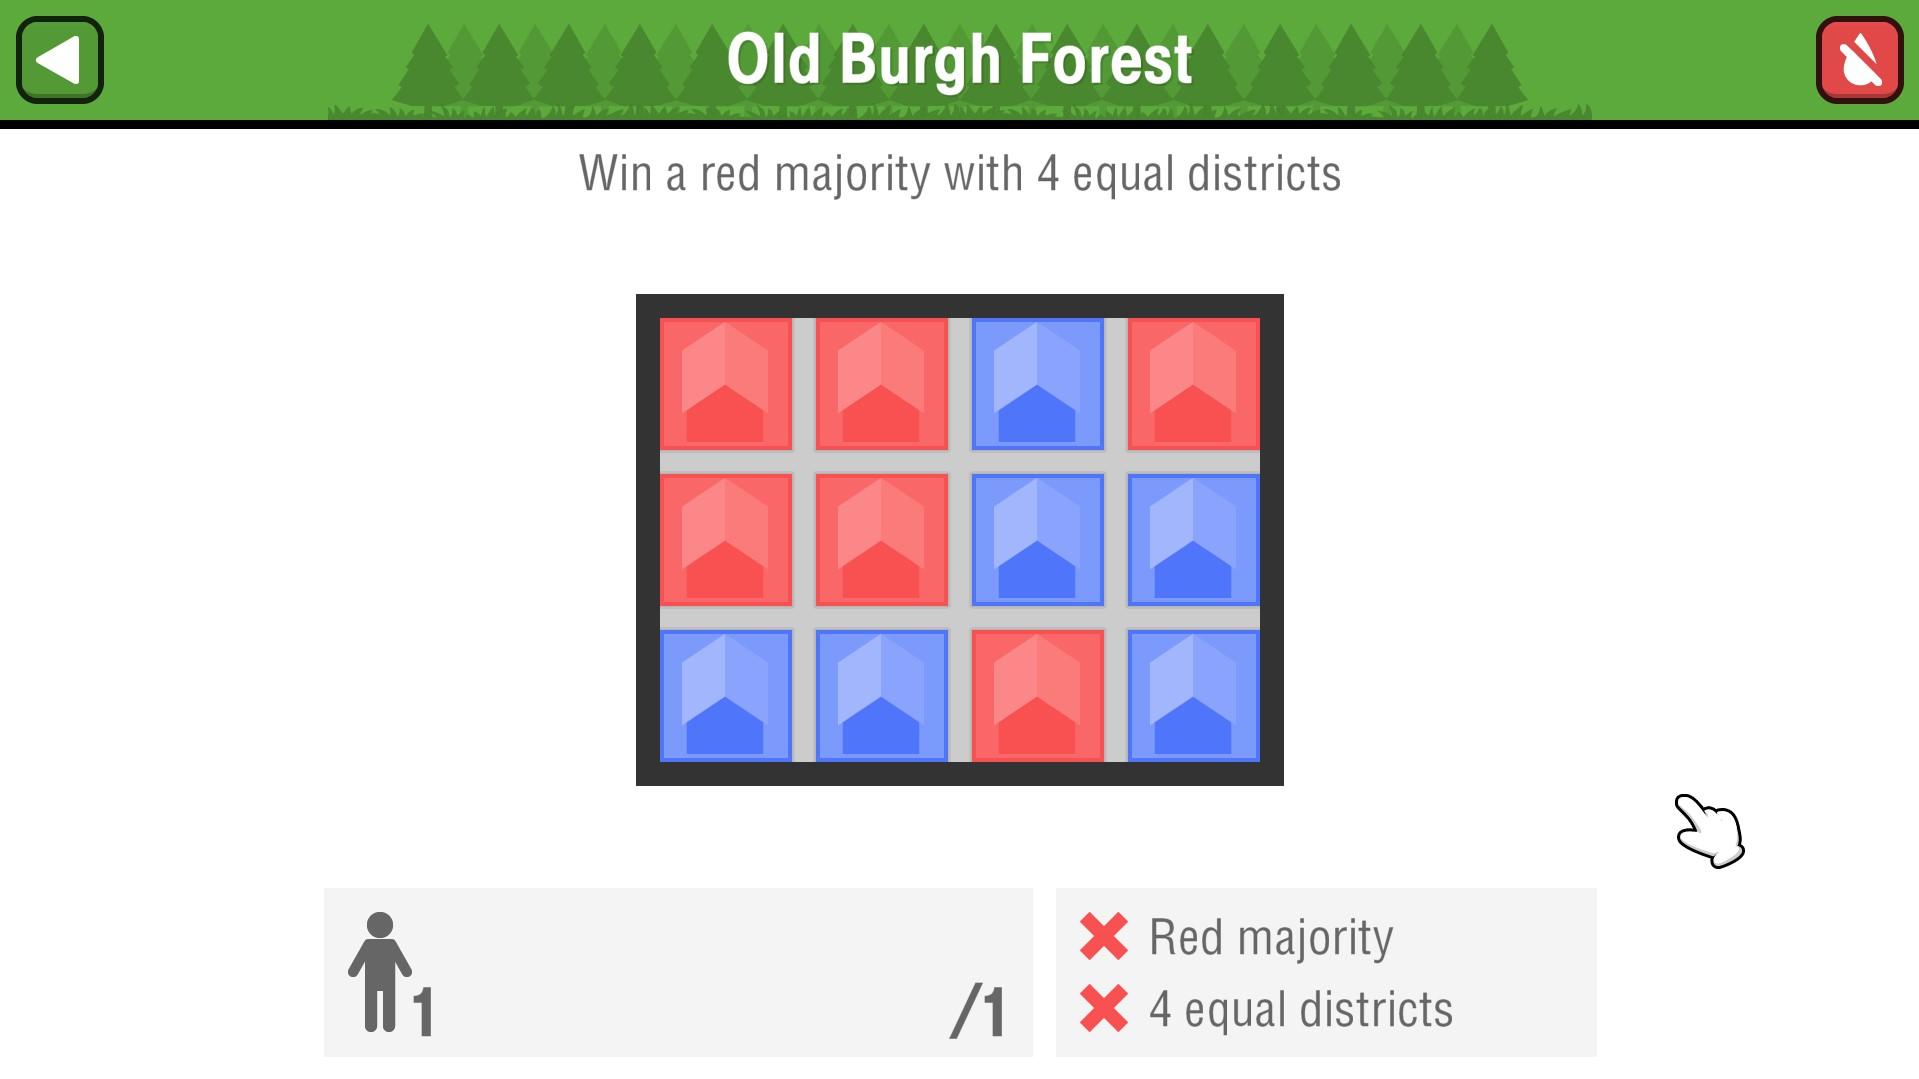 Old Burgh Forest